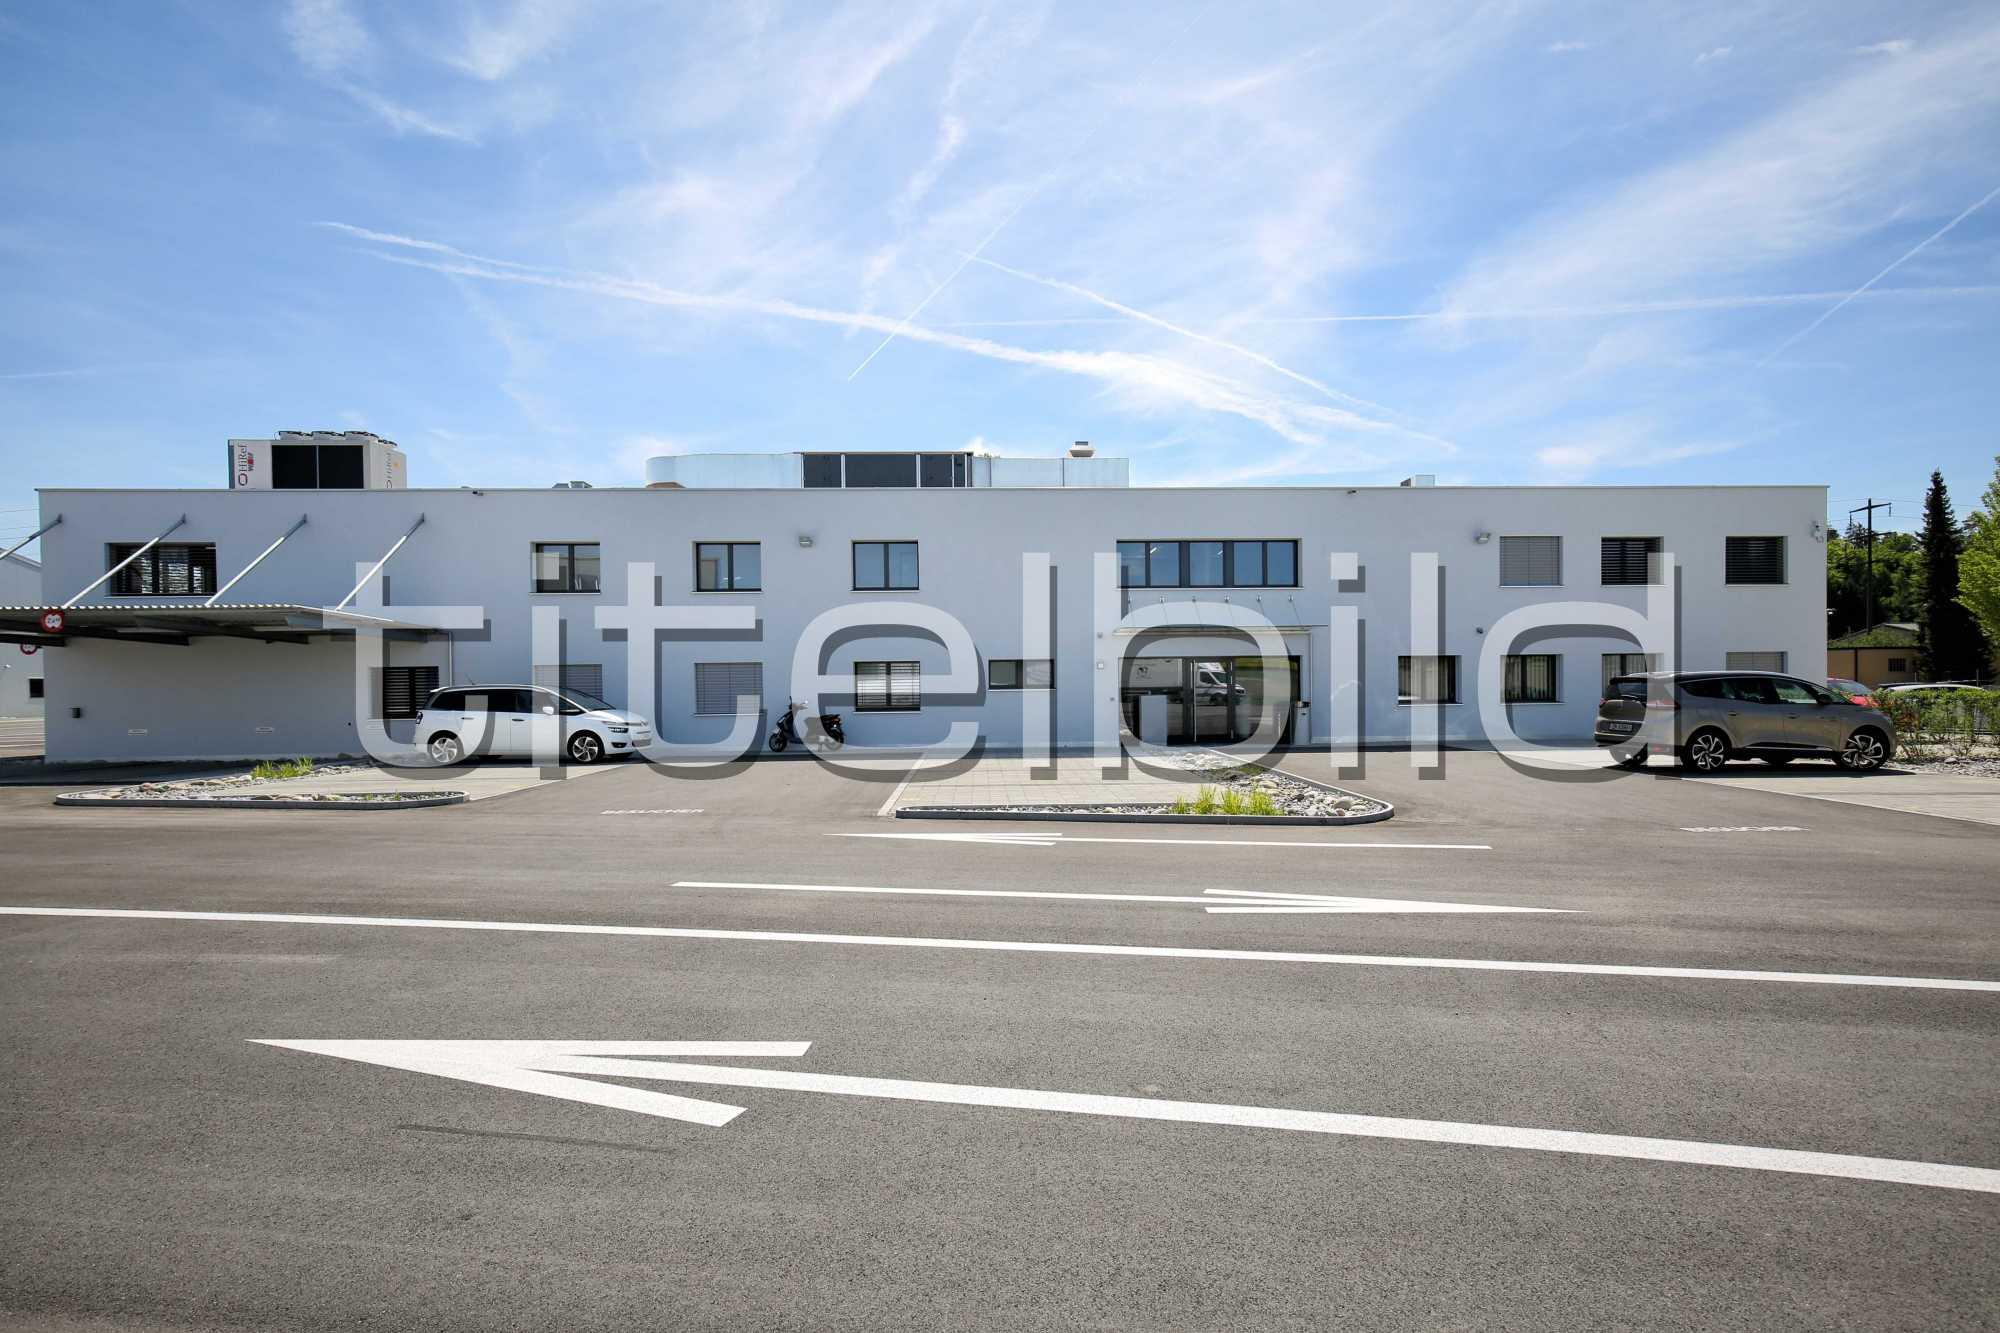 Projektbild-Nr. 1: Neubau Strassenverkehrsamt Kanton Zürich